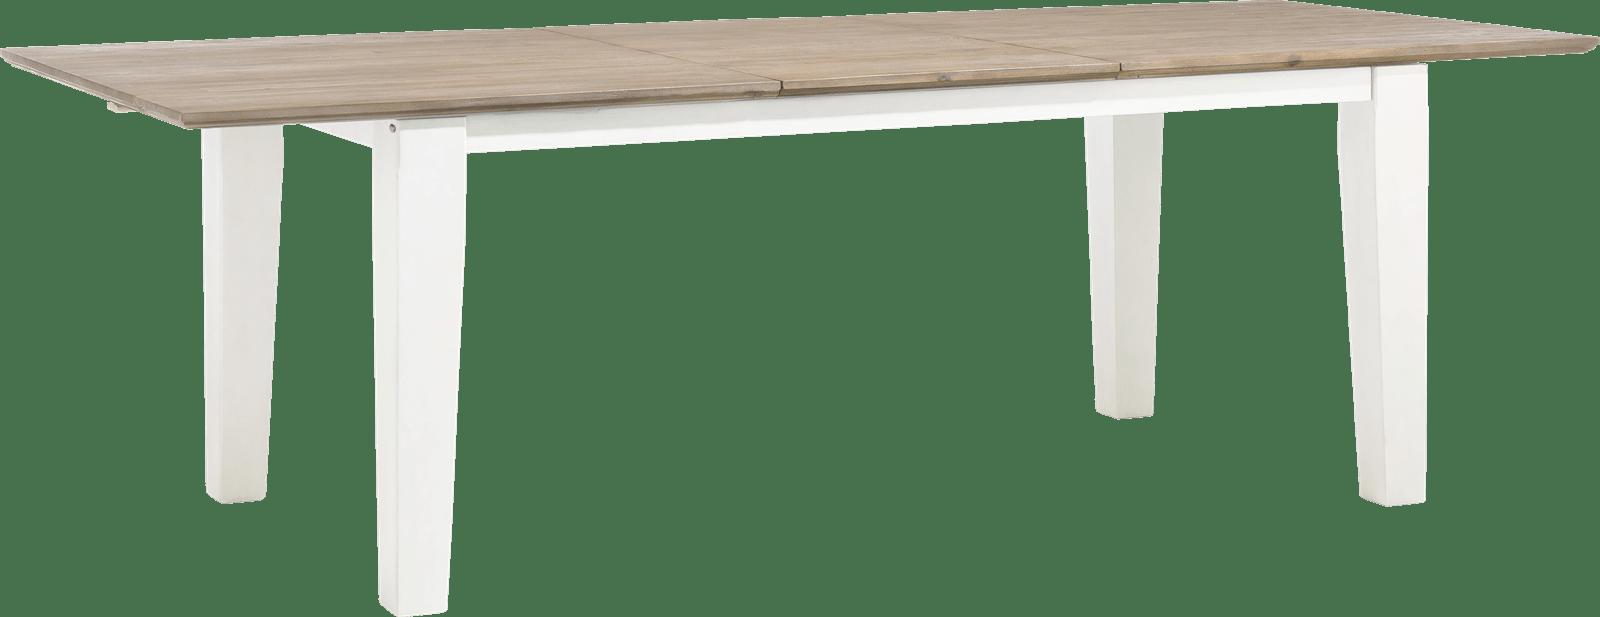 Henders & Hazel - Le Port - Landlich - ausziehtisch 160 (+ 60) x 100 cm